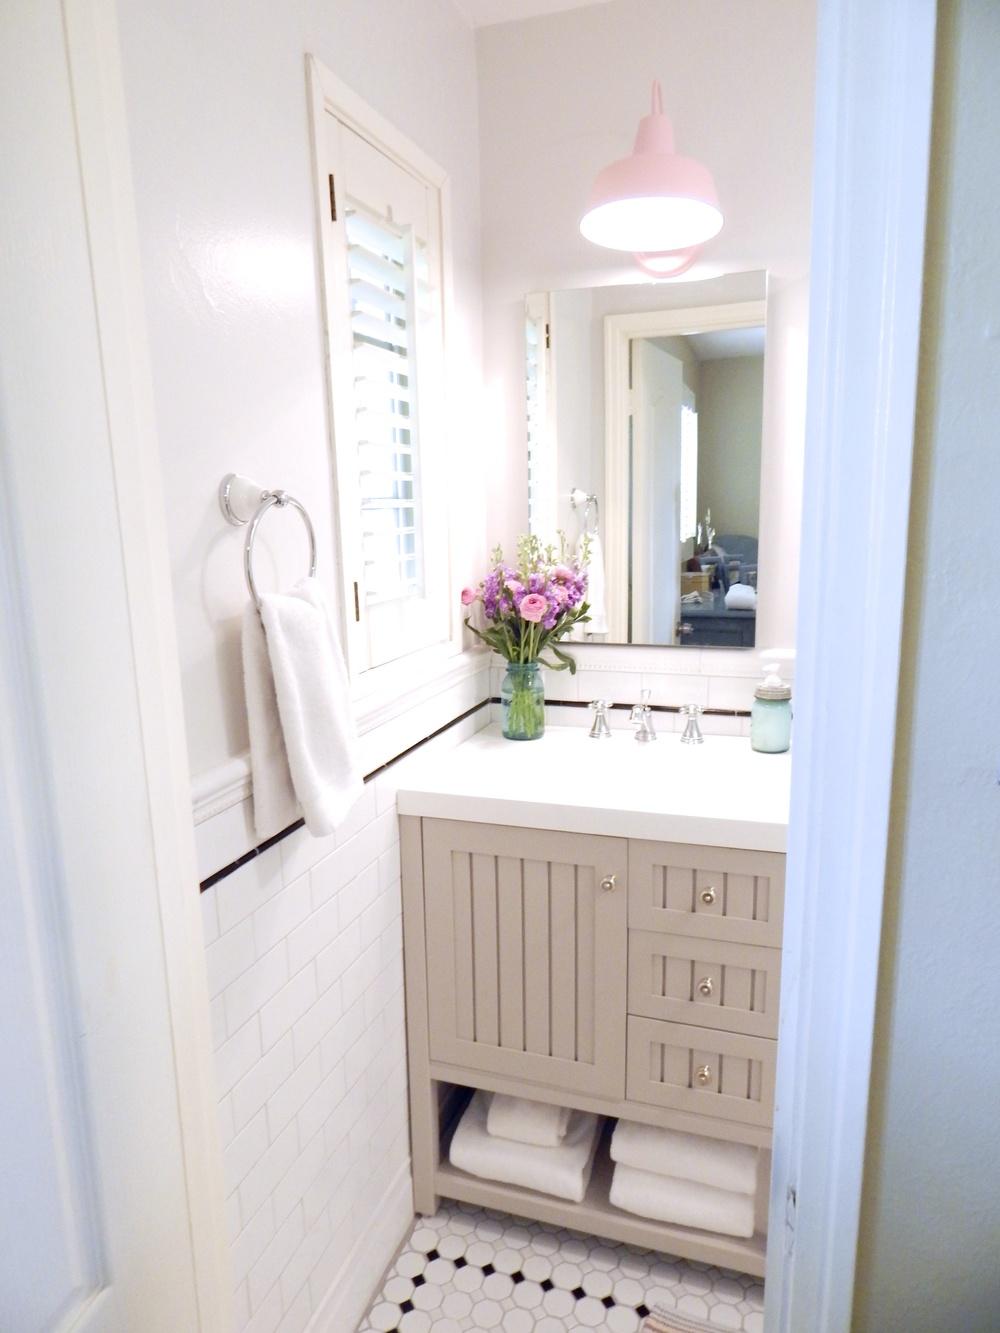 Tiny Bathroom Remodel - Love and Specs